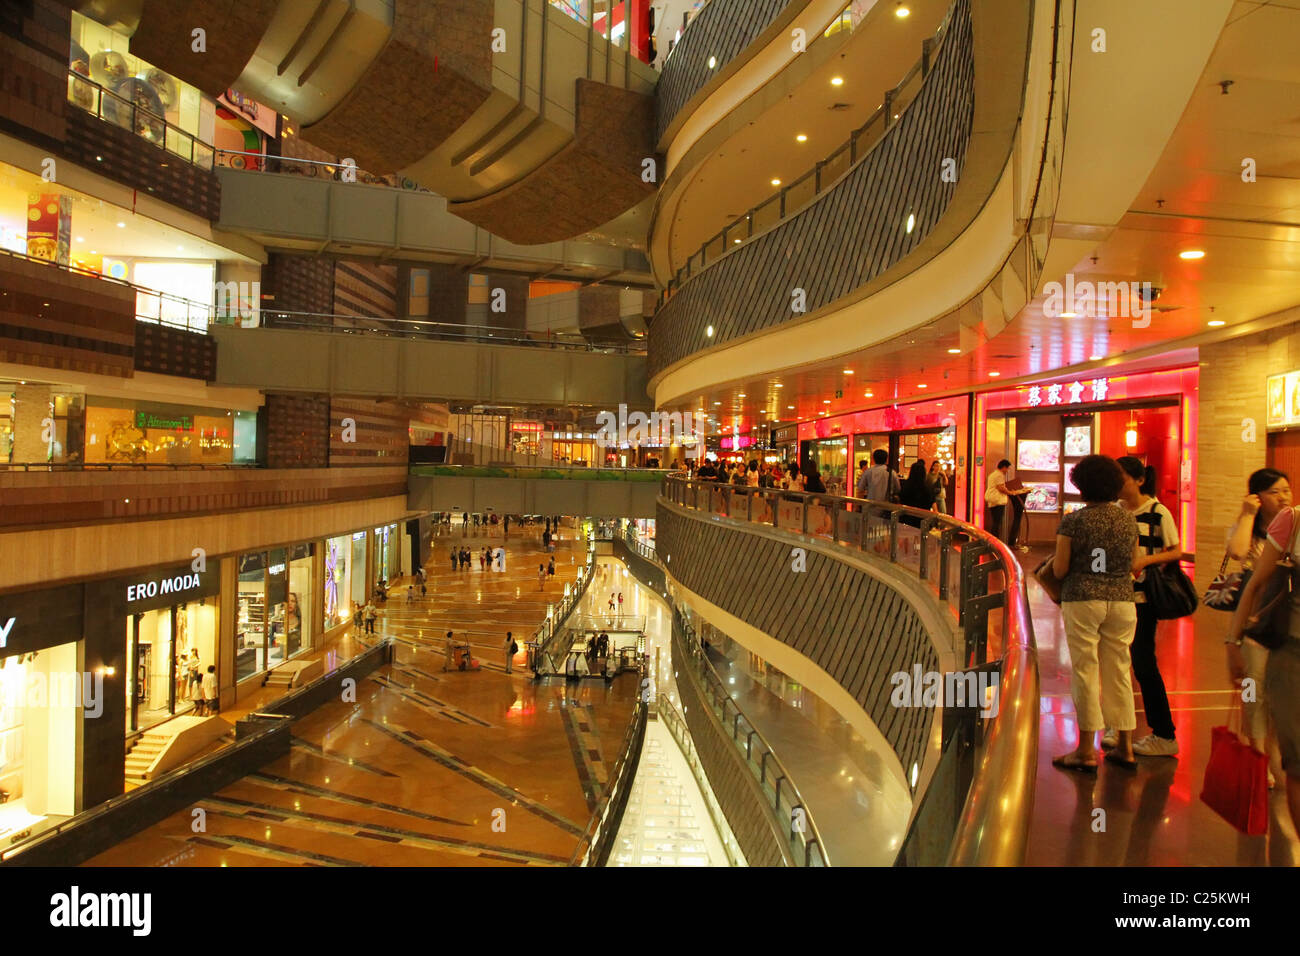 Super Brand Mall interior. Pudong, Shanghai, China. - Stock Image